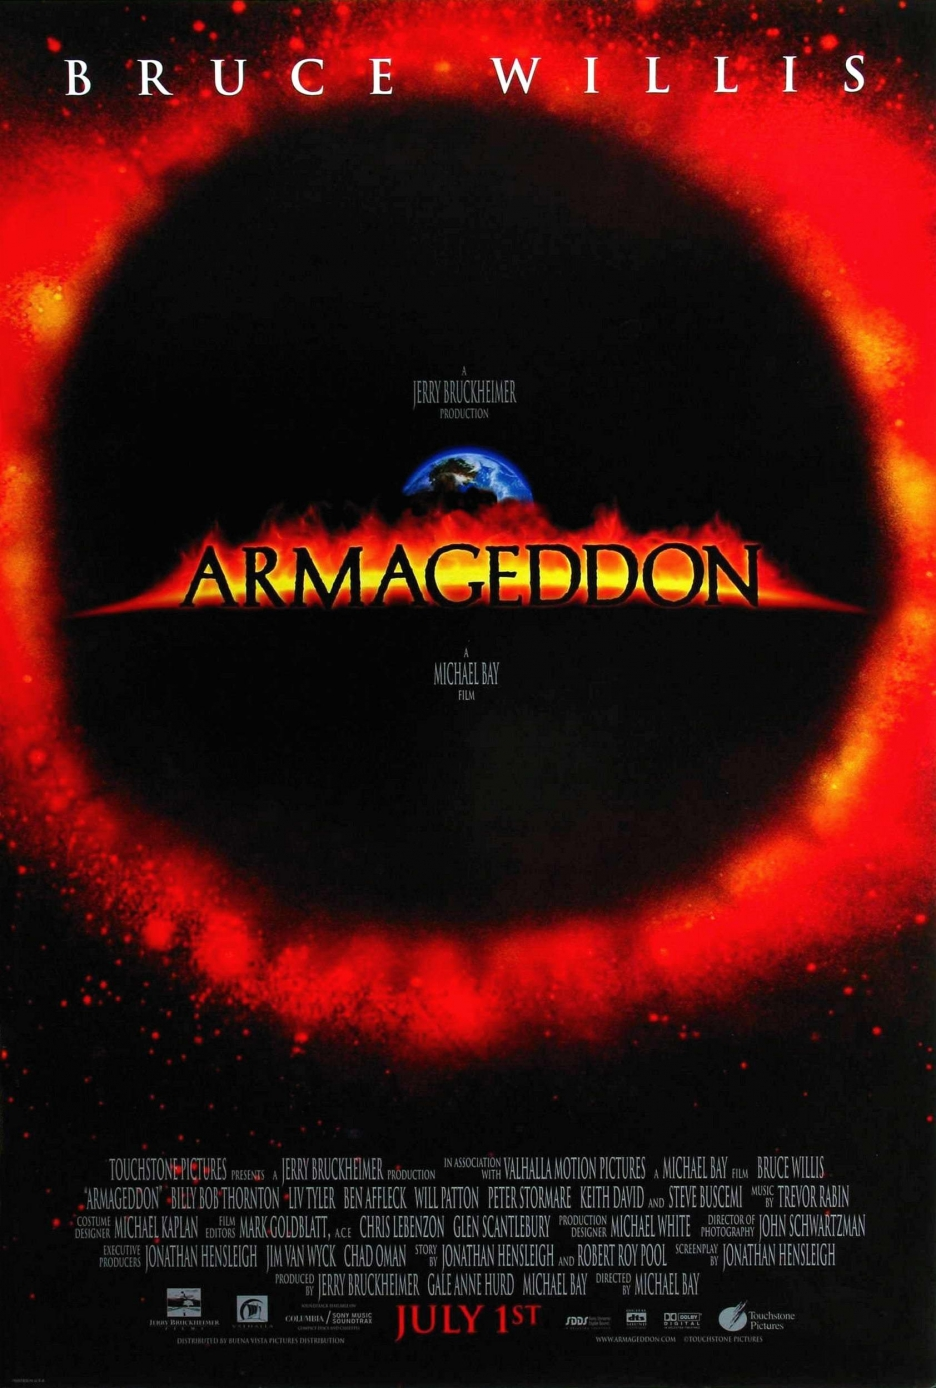 Armageddon (1998) mHD   [6ERUAN9]